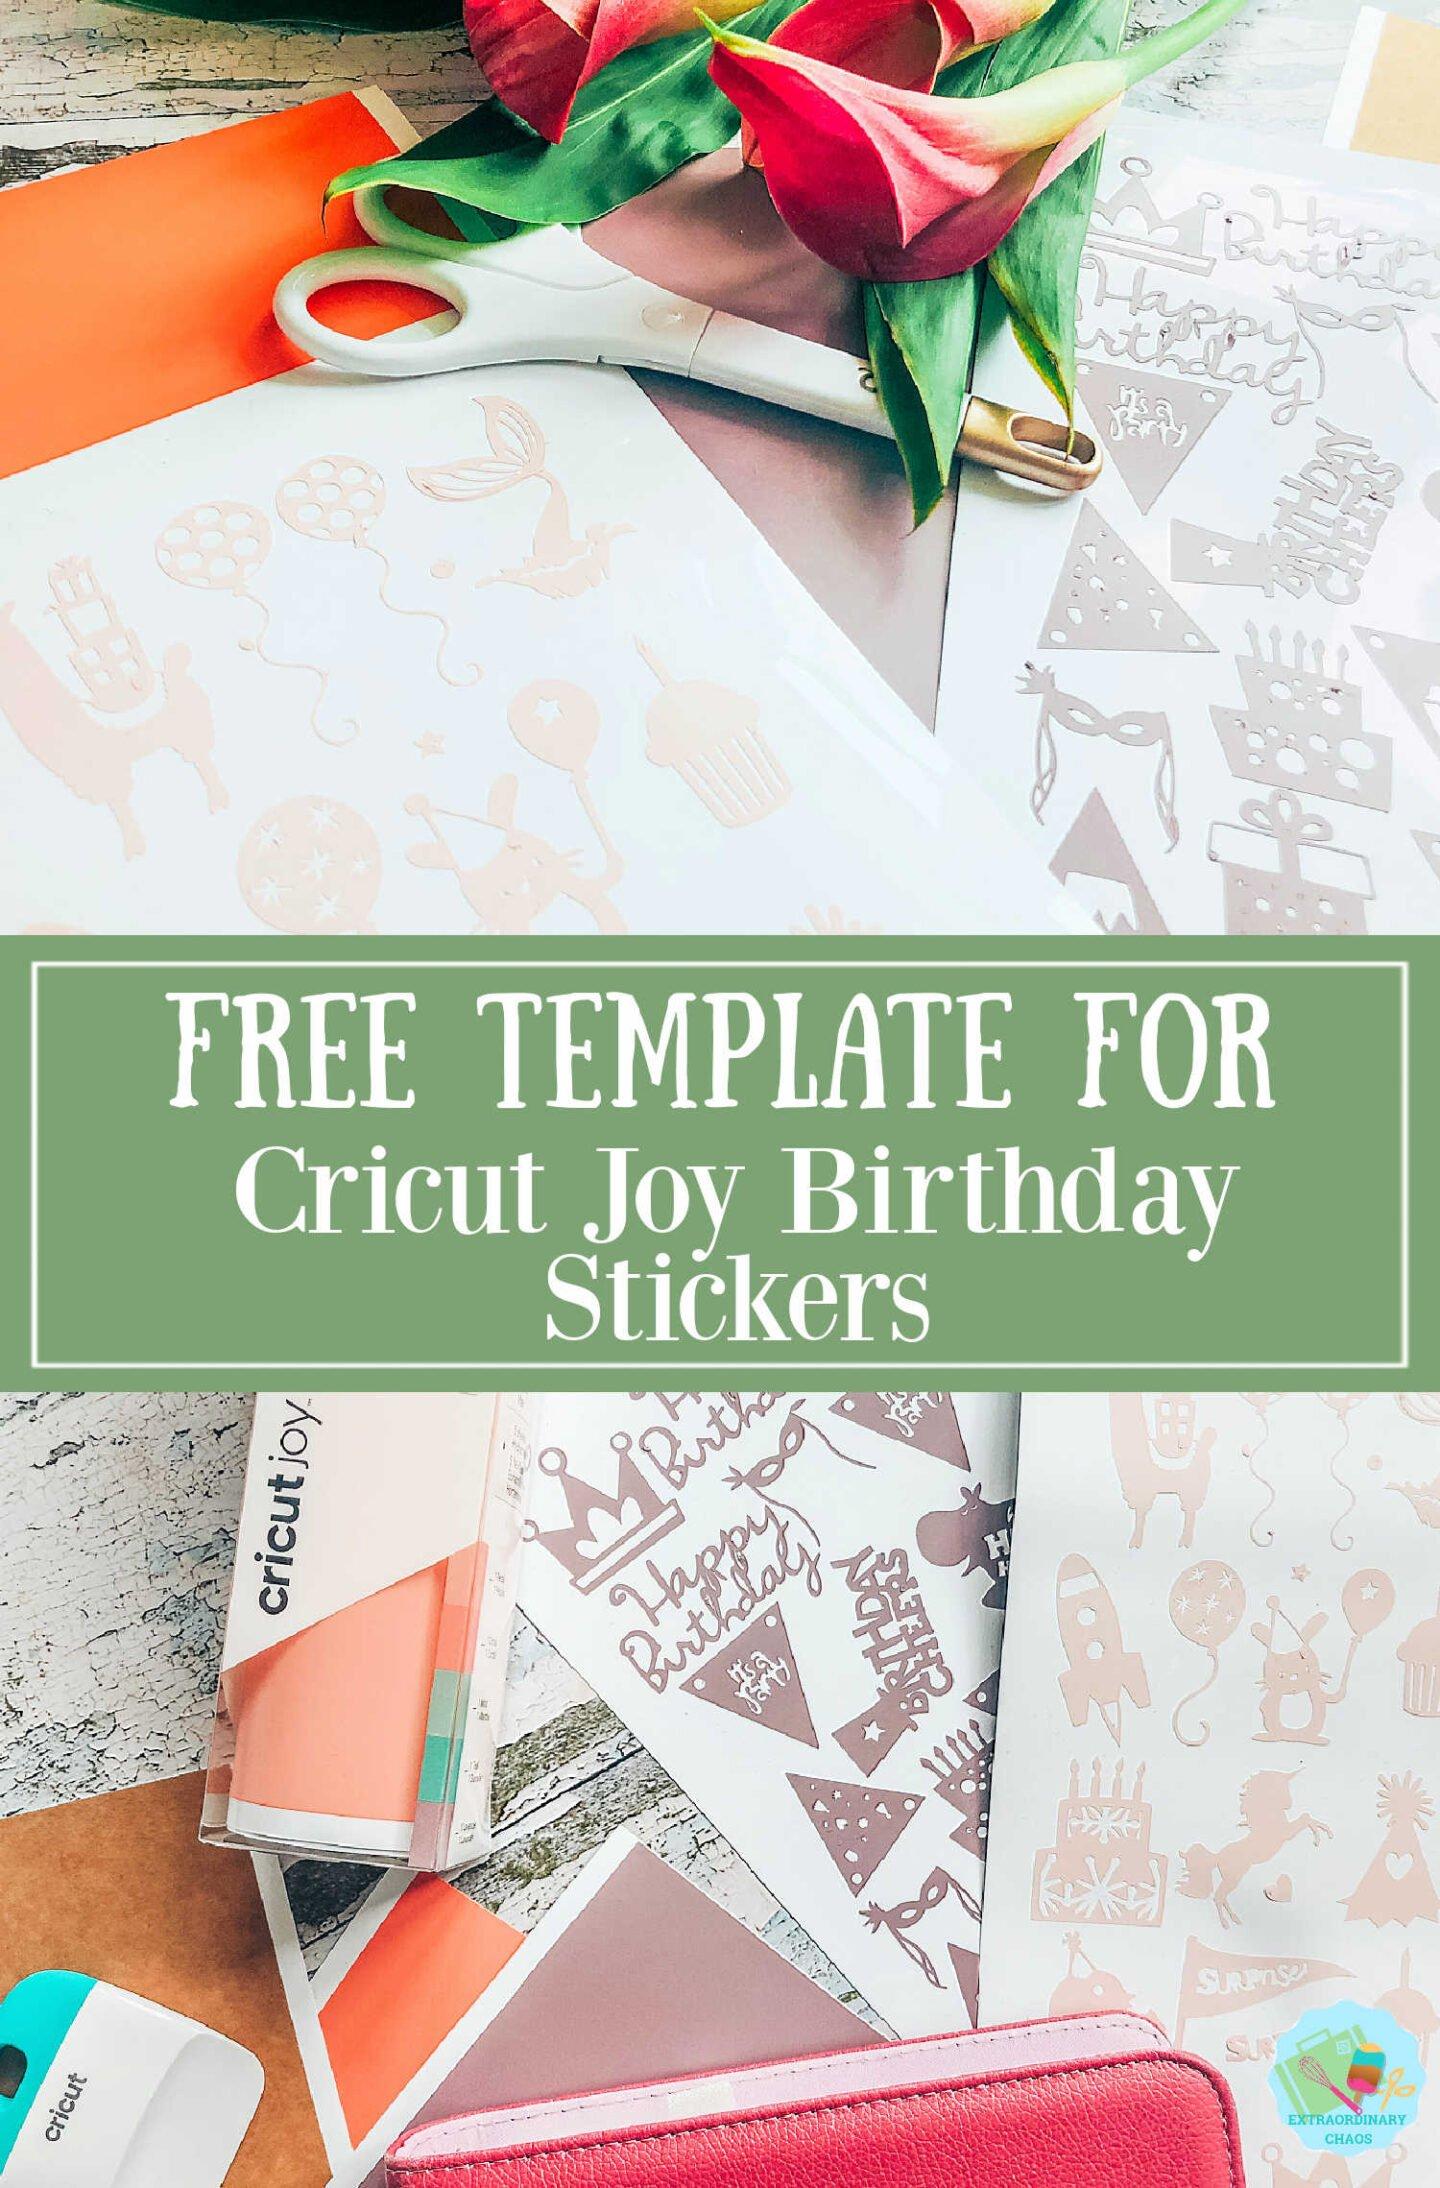 Free template for Cricut Joy Birthday Stickers -2